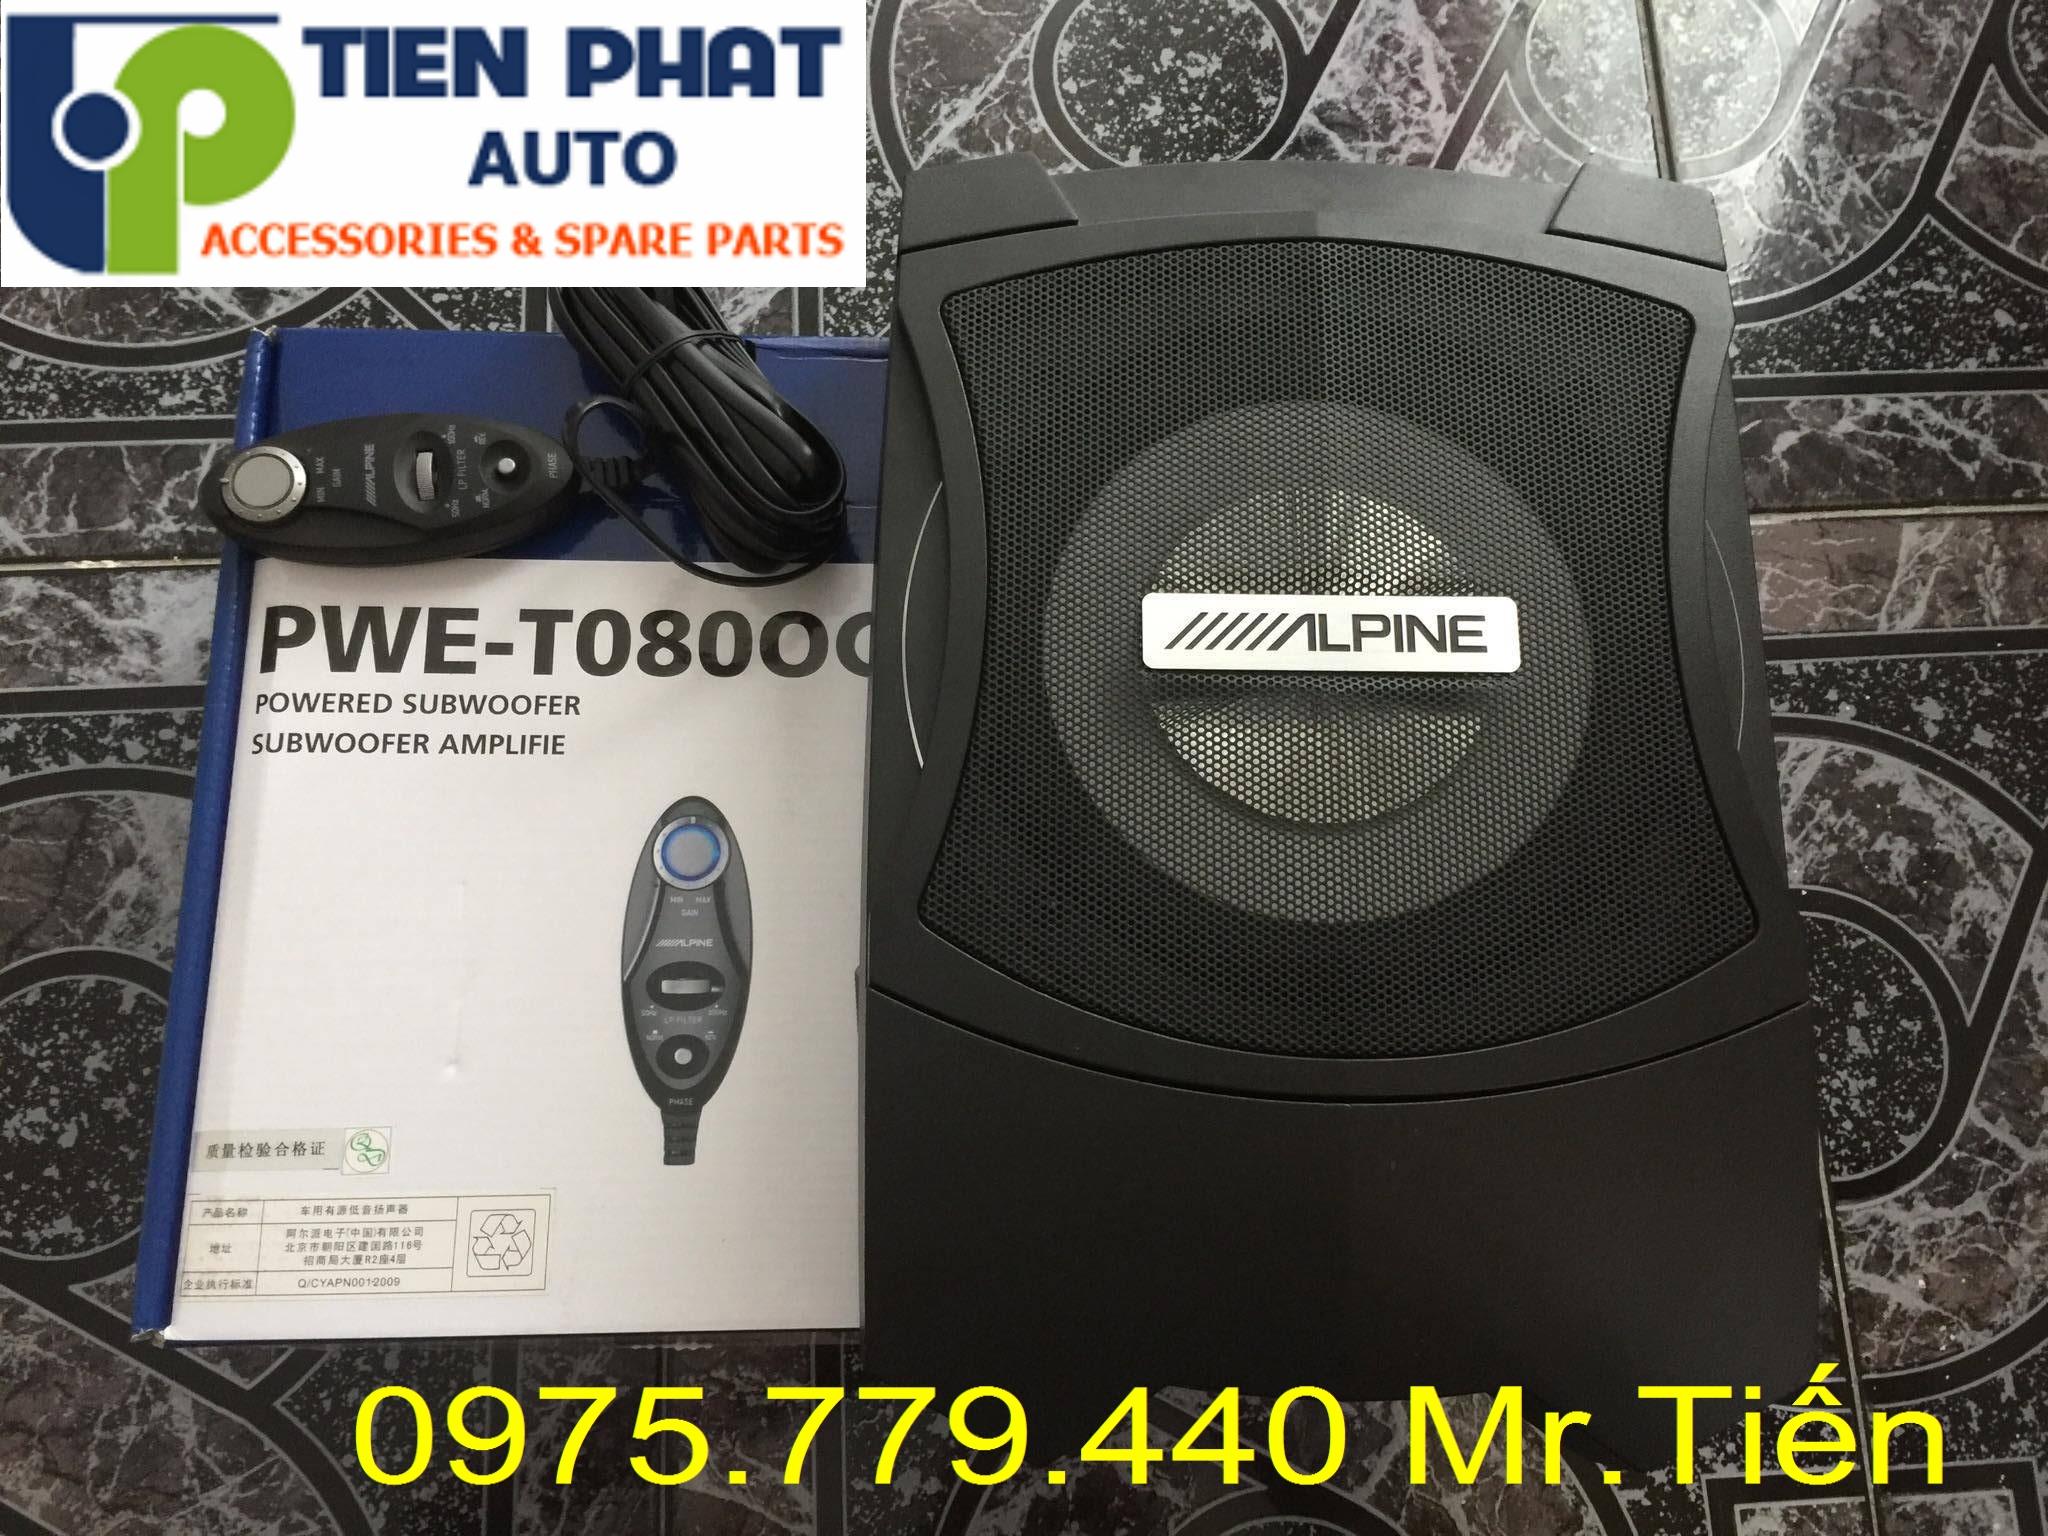 Lắp Loa sub Alpine PWE-T0800C cho Toyota Altis Lắp Đặt Tận Nơi